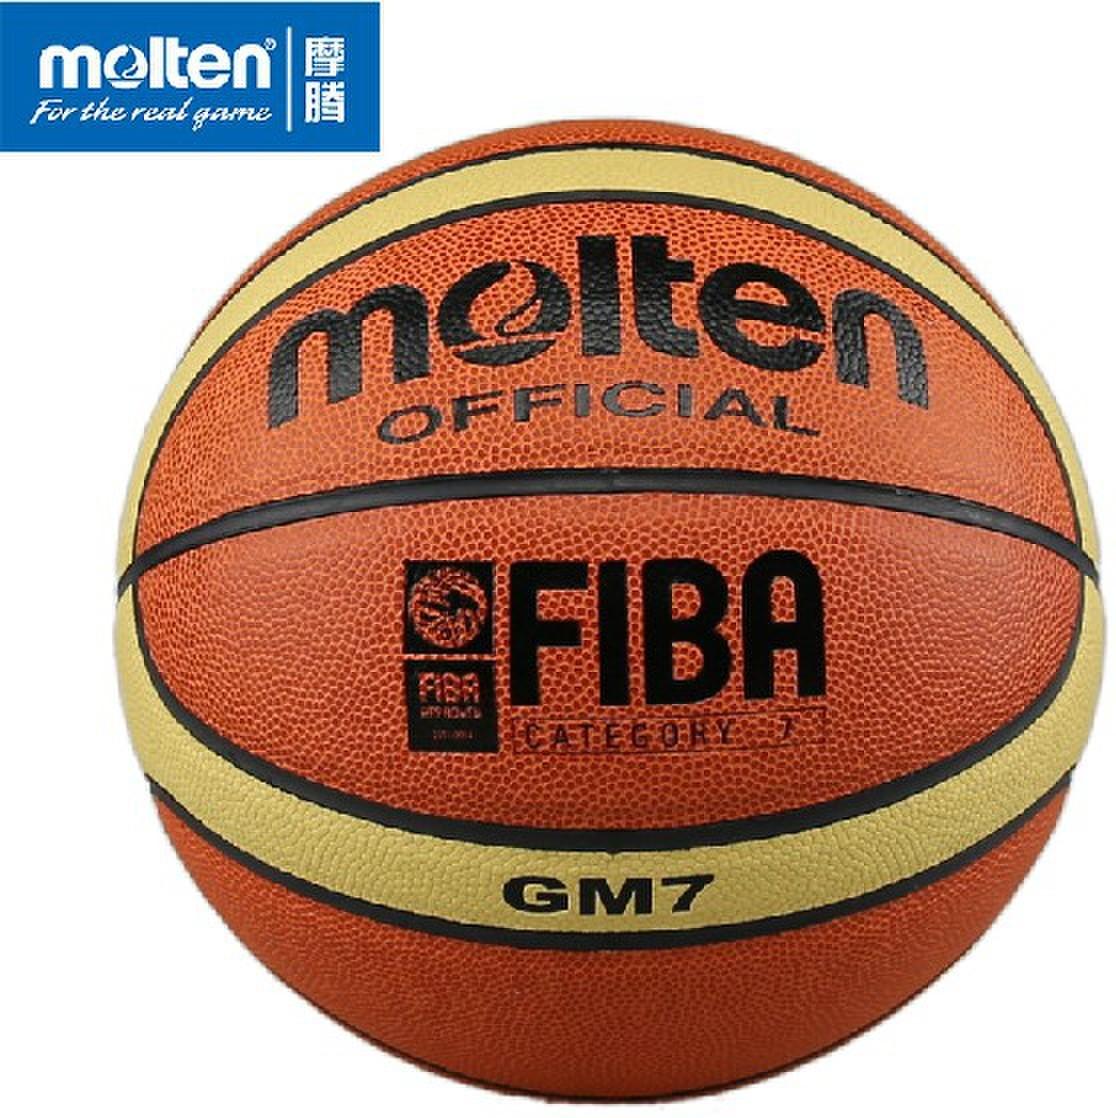 Баскетбольный мяч Molten BGM7 PU Molten / Matanga